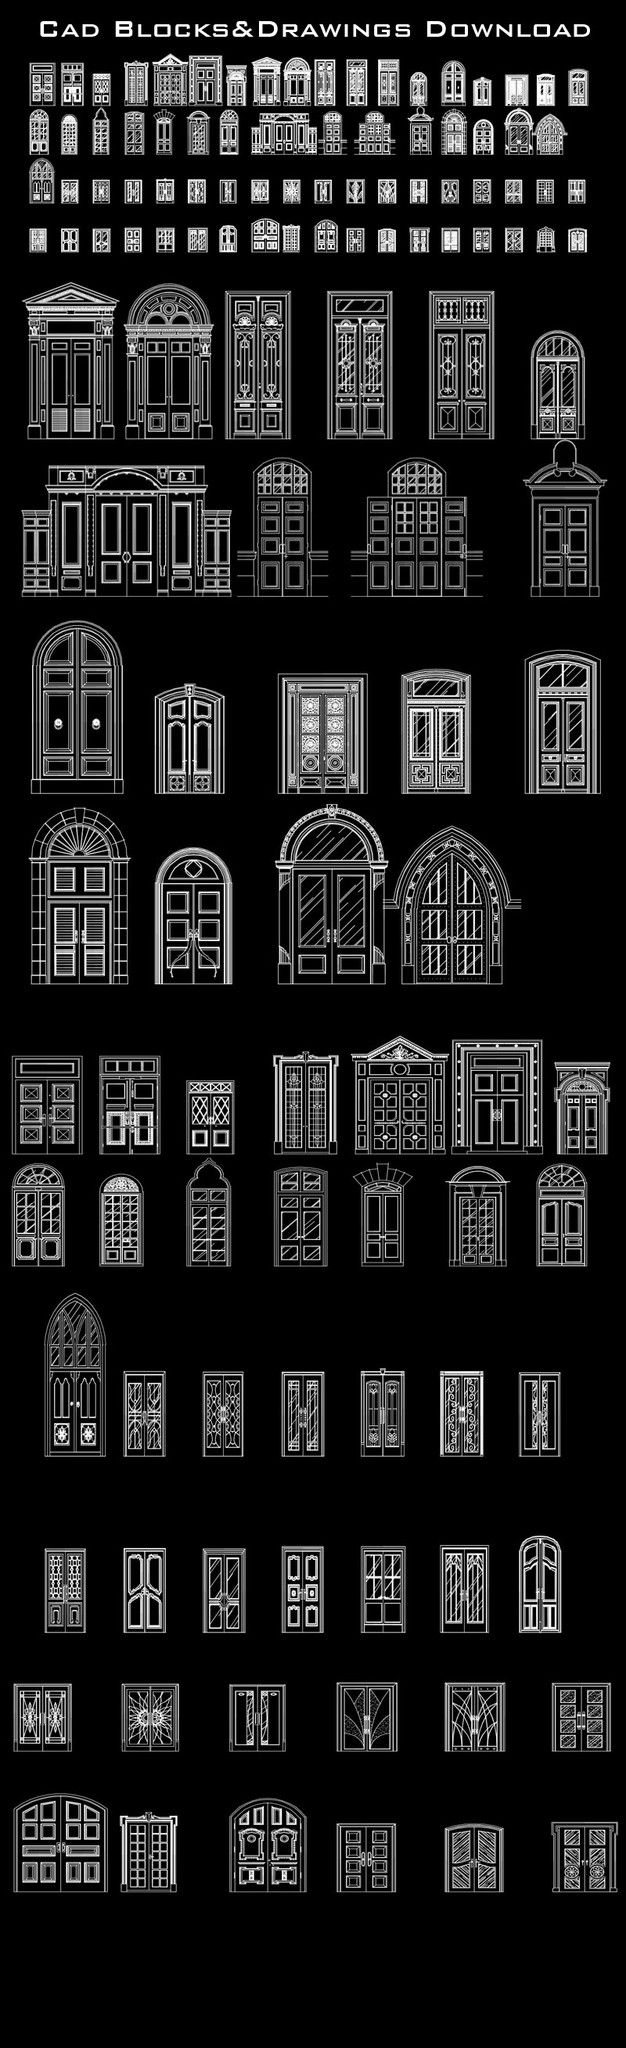 Best door design ideas – CAD Design | Free CAD Blocks,Drawings,Details